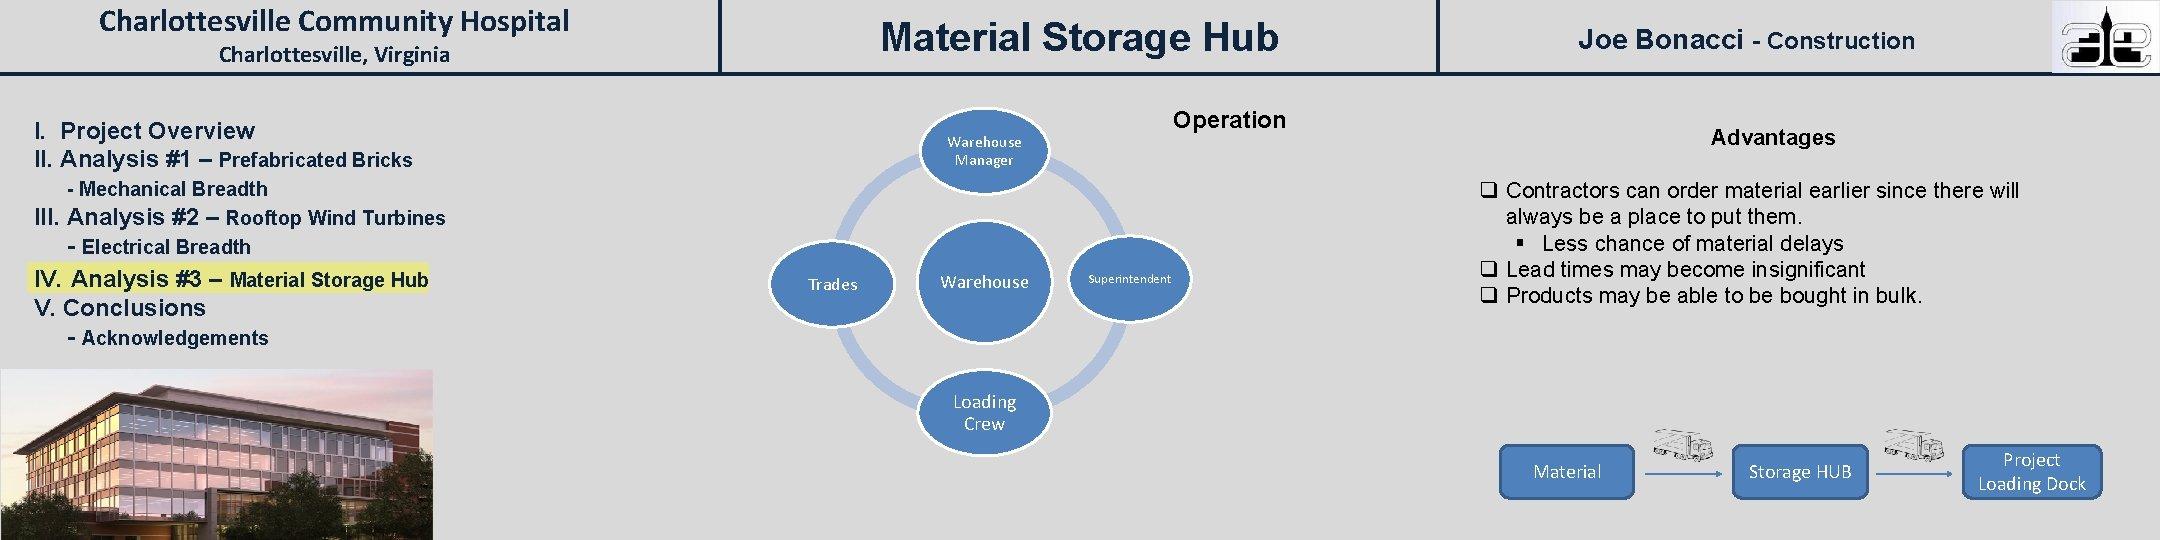 Charlottesville Community Hospital Material Storage Hub Charlottesville, Virginia I. Project Overview II. Analysis #1